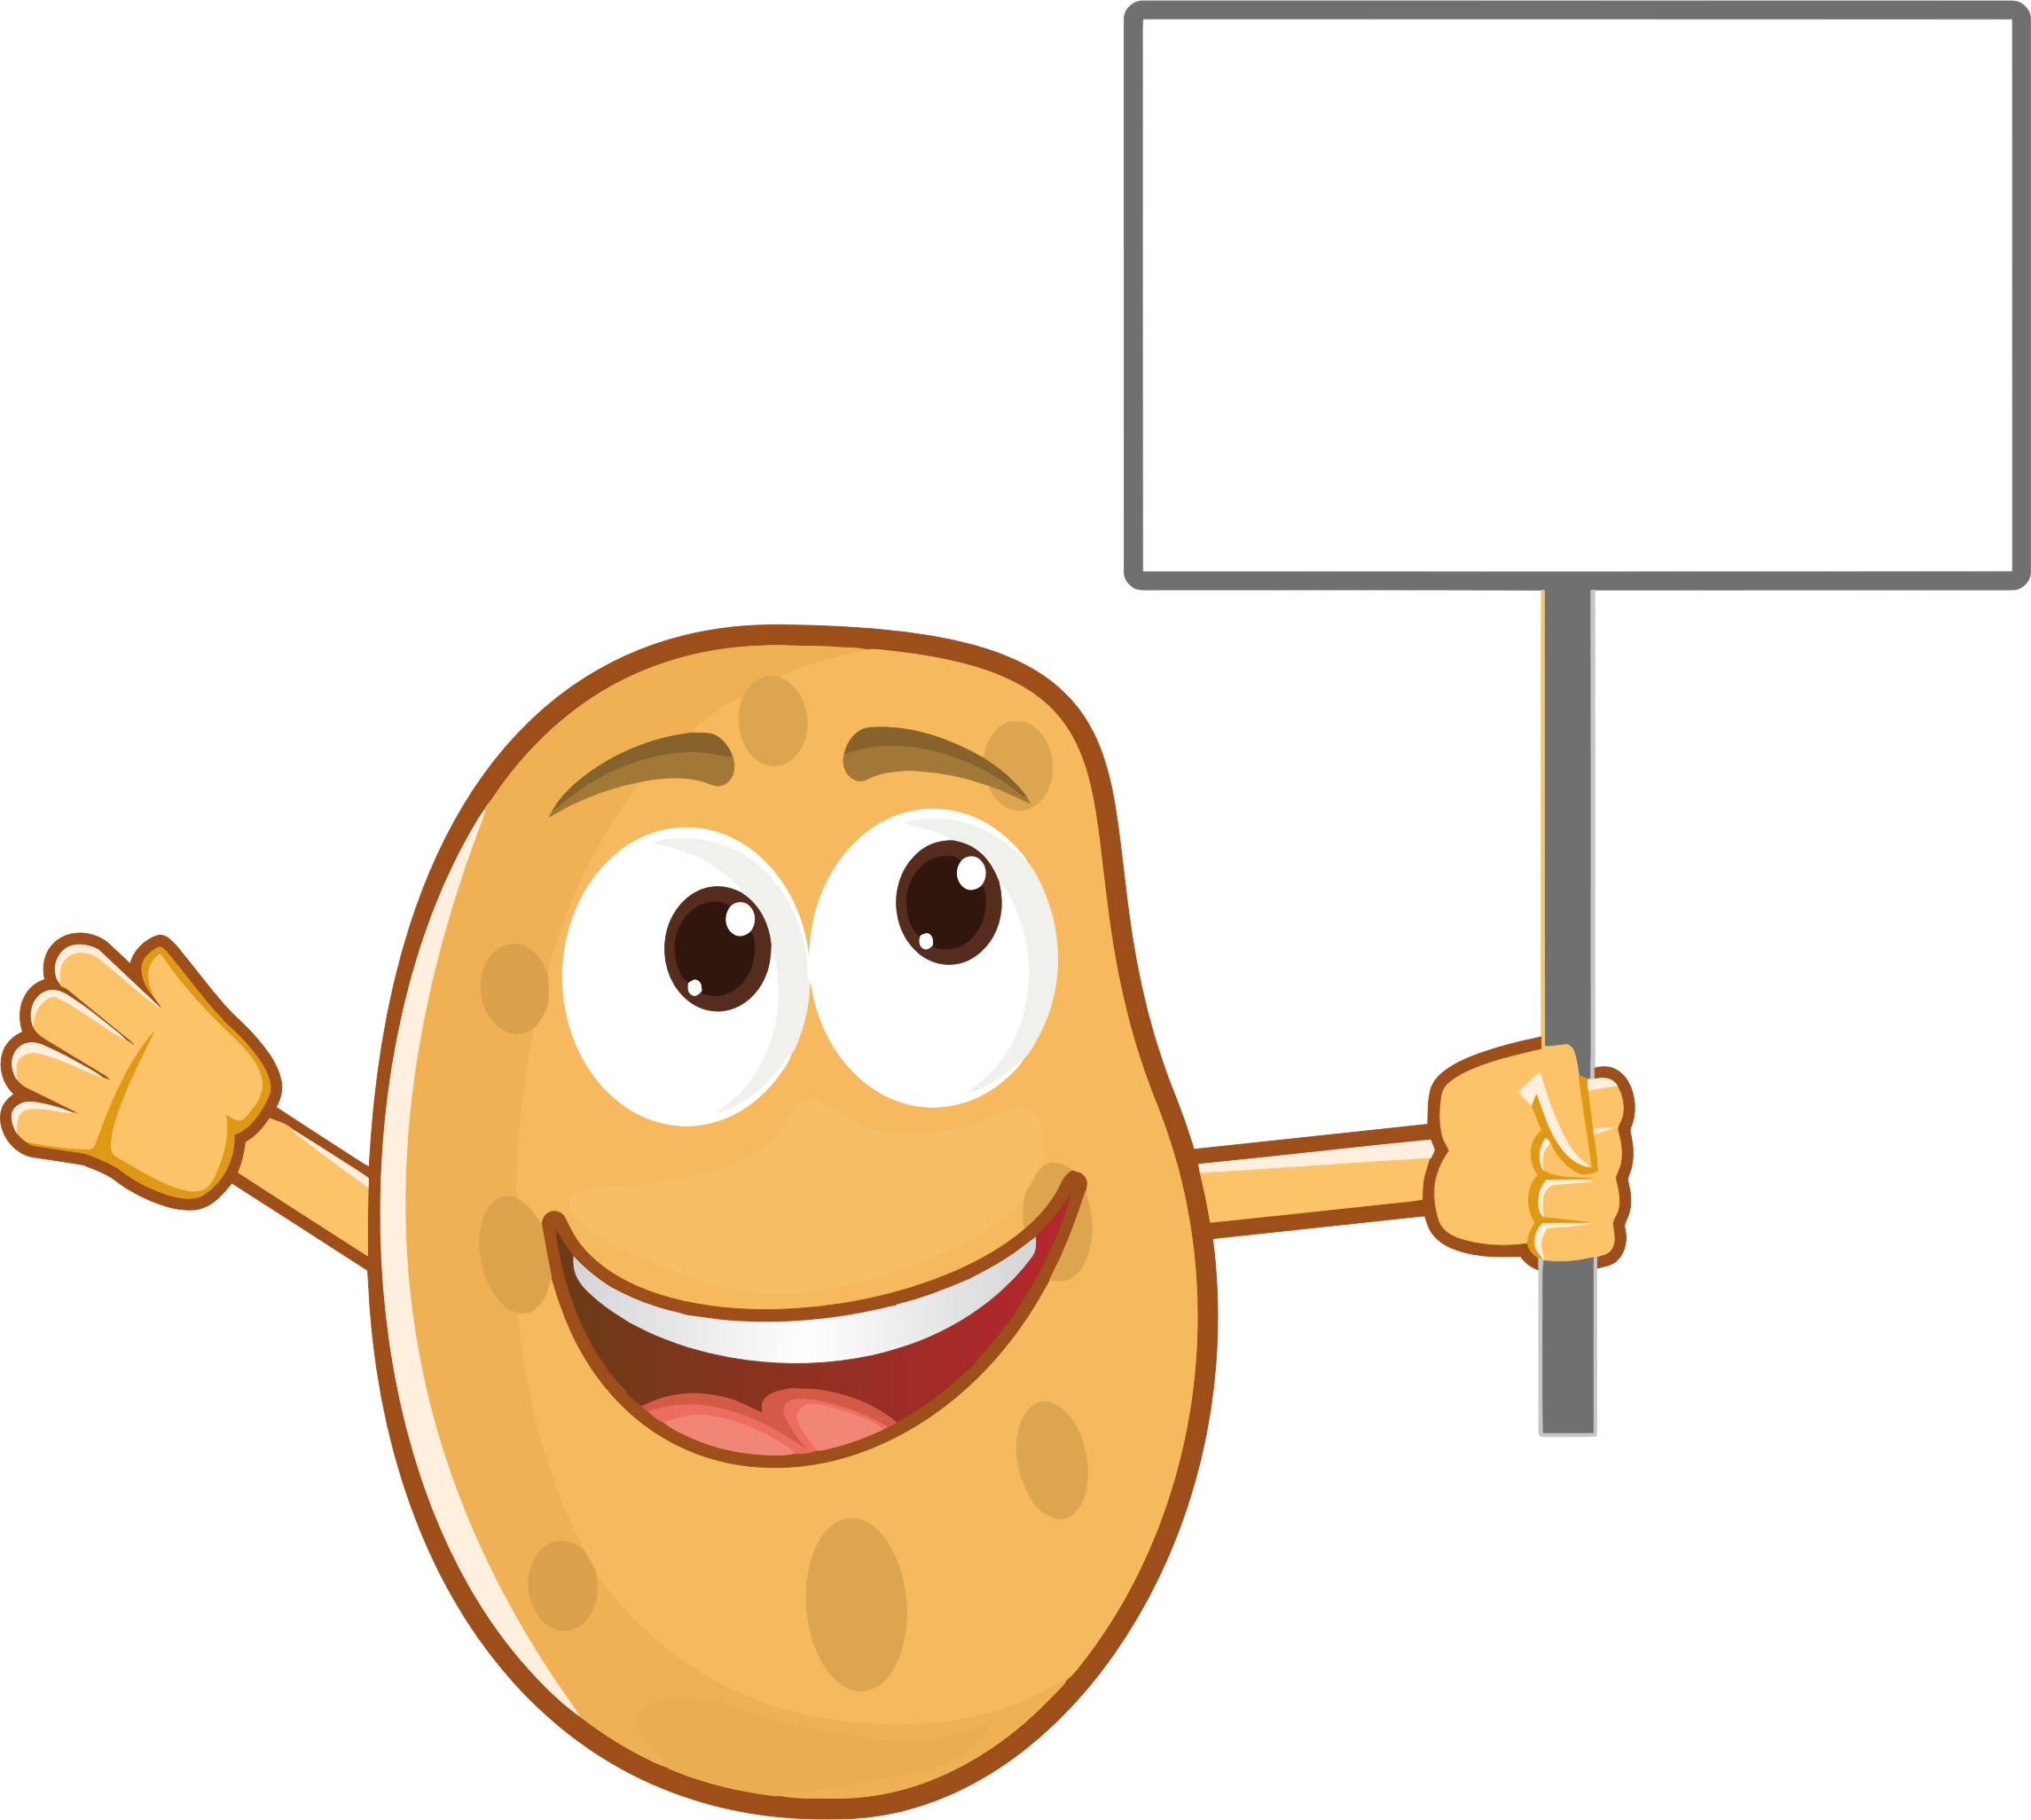 Mr clipart hot potato, Mr hot potato Transparent FREE for.